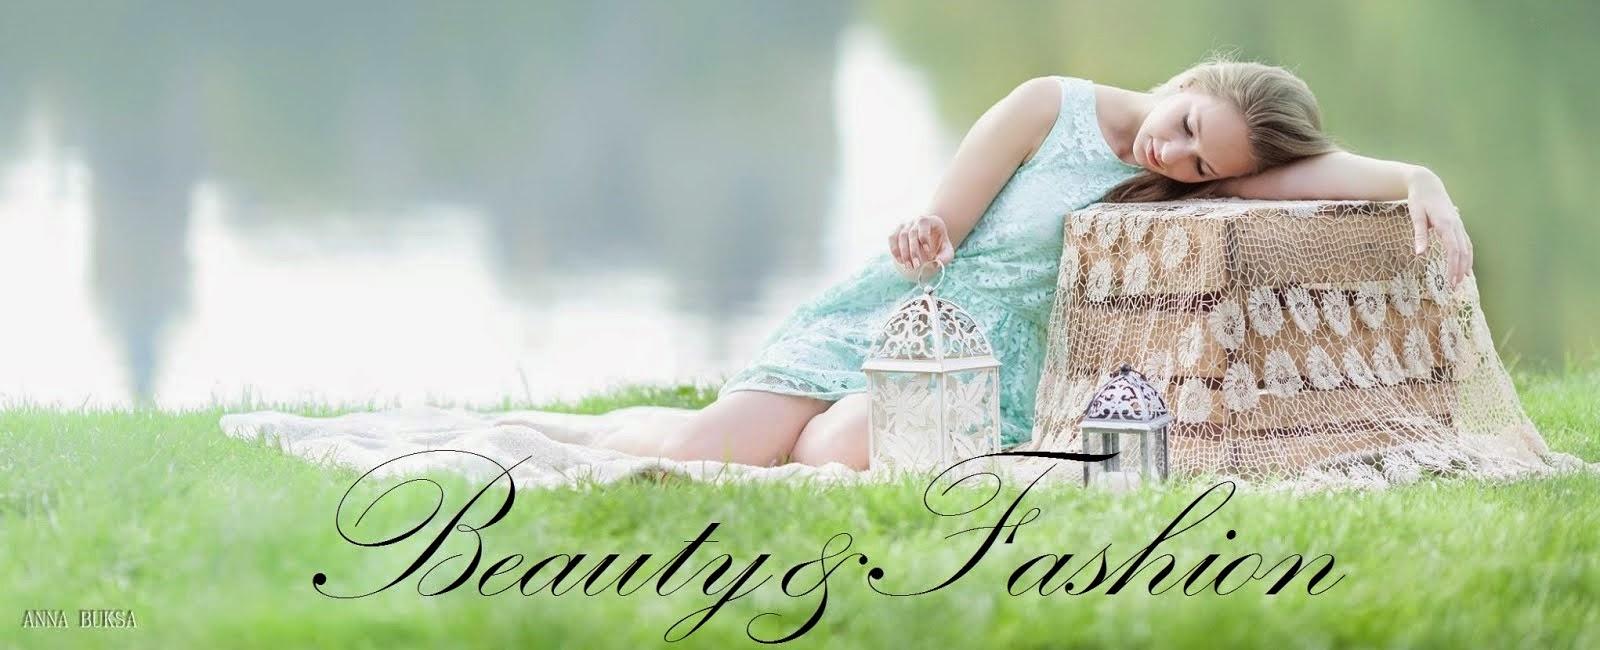 Beauty&Fashion